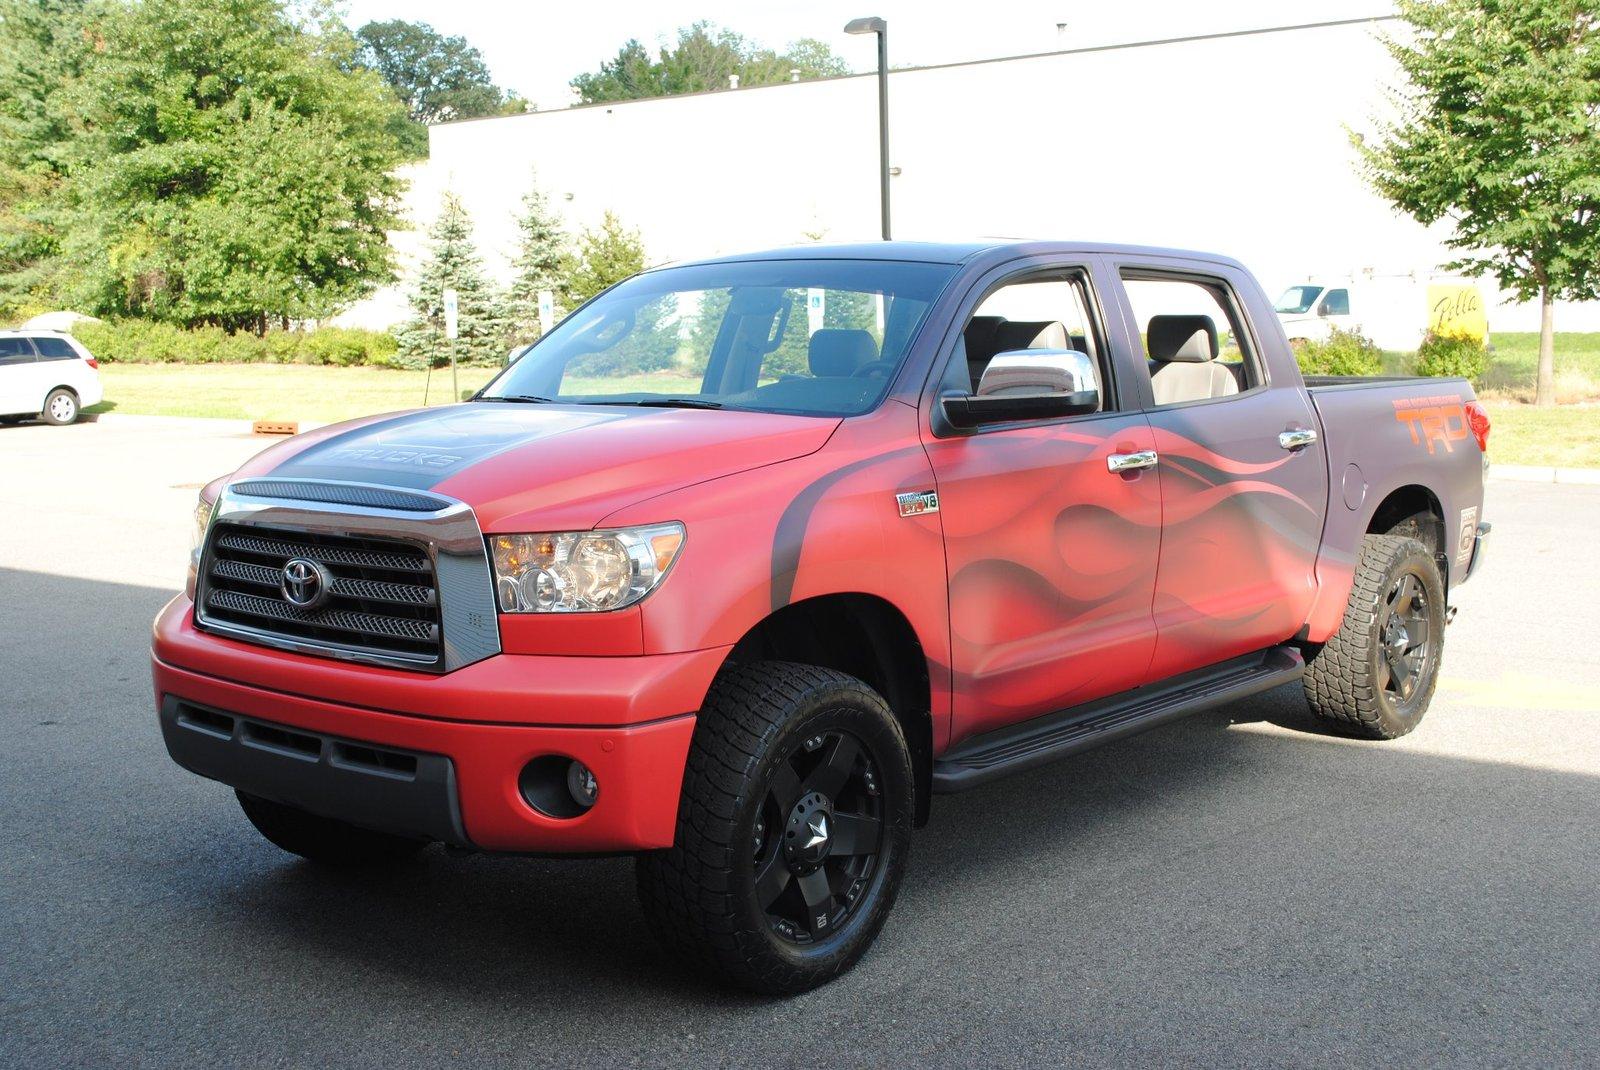 Toyota Tundra Hood Blackout 2007-2013